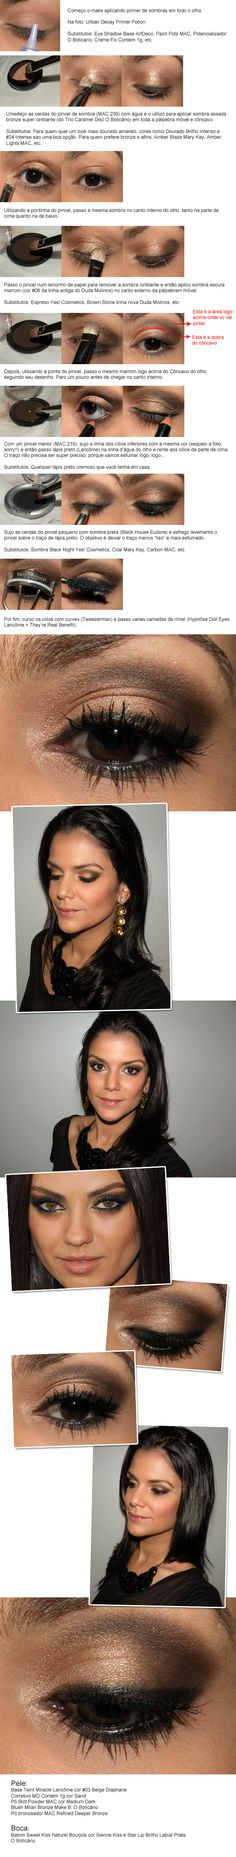 Mila Kunis makeup by marina smith